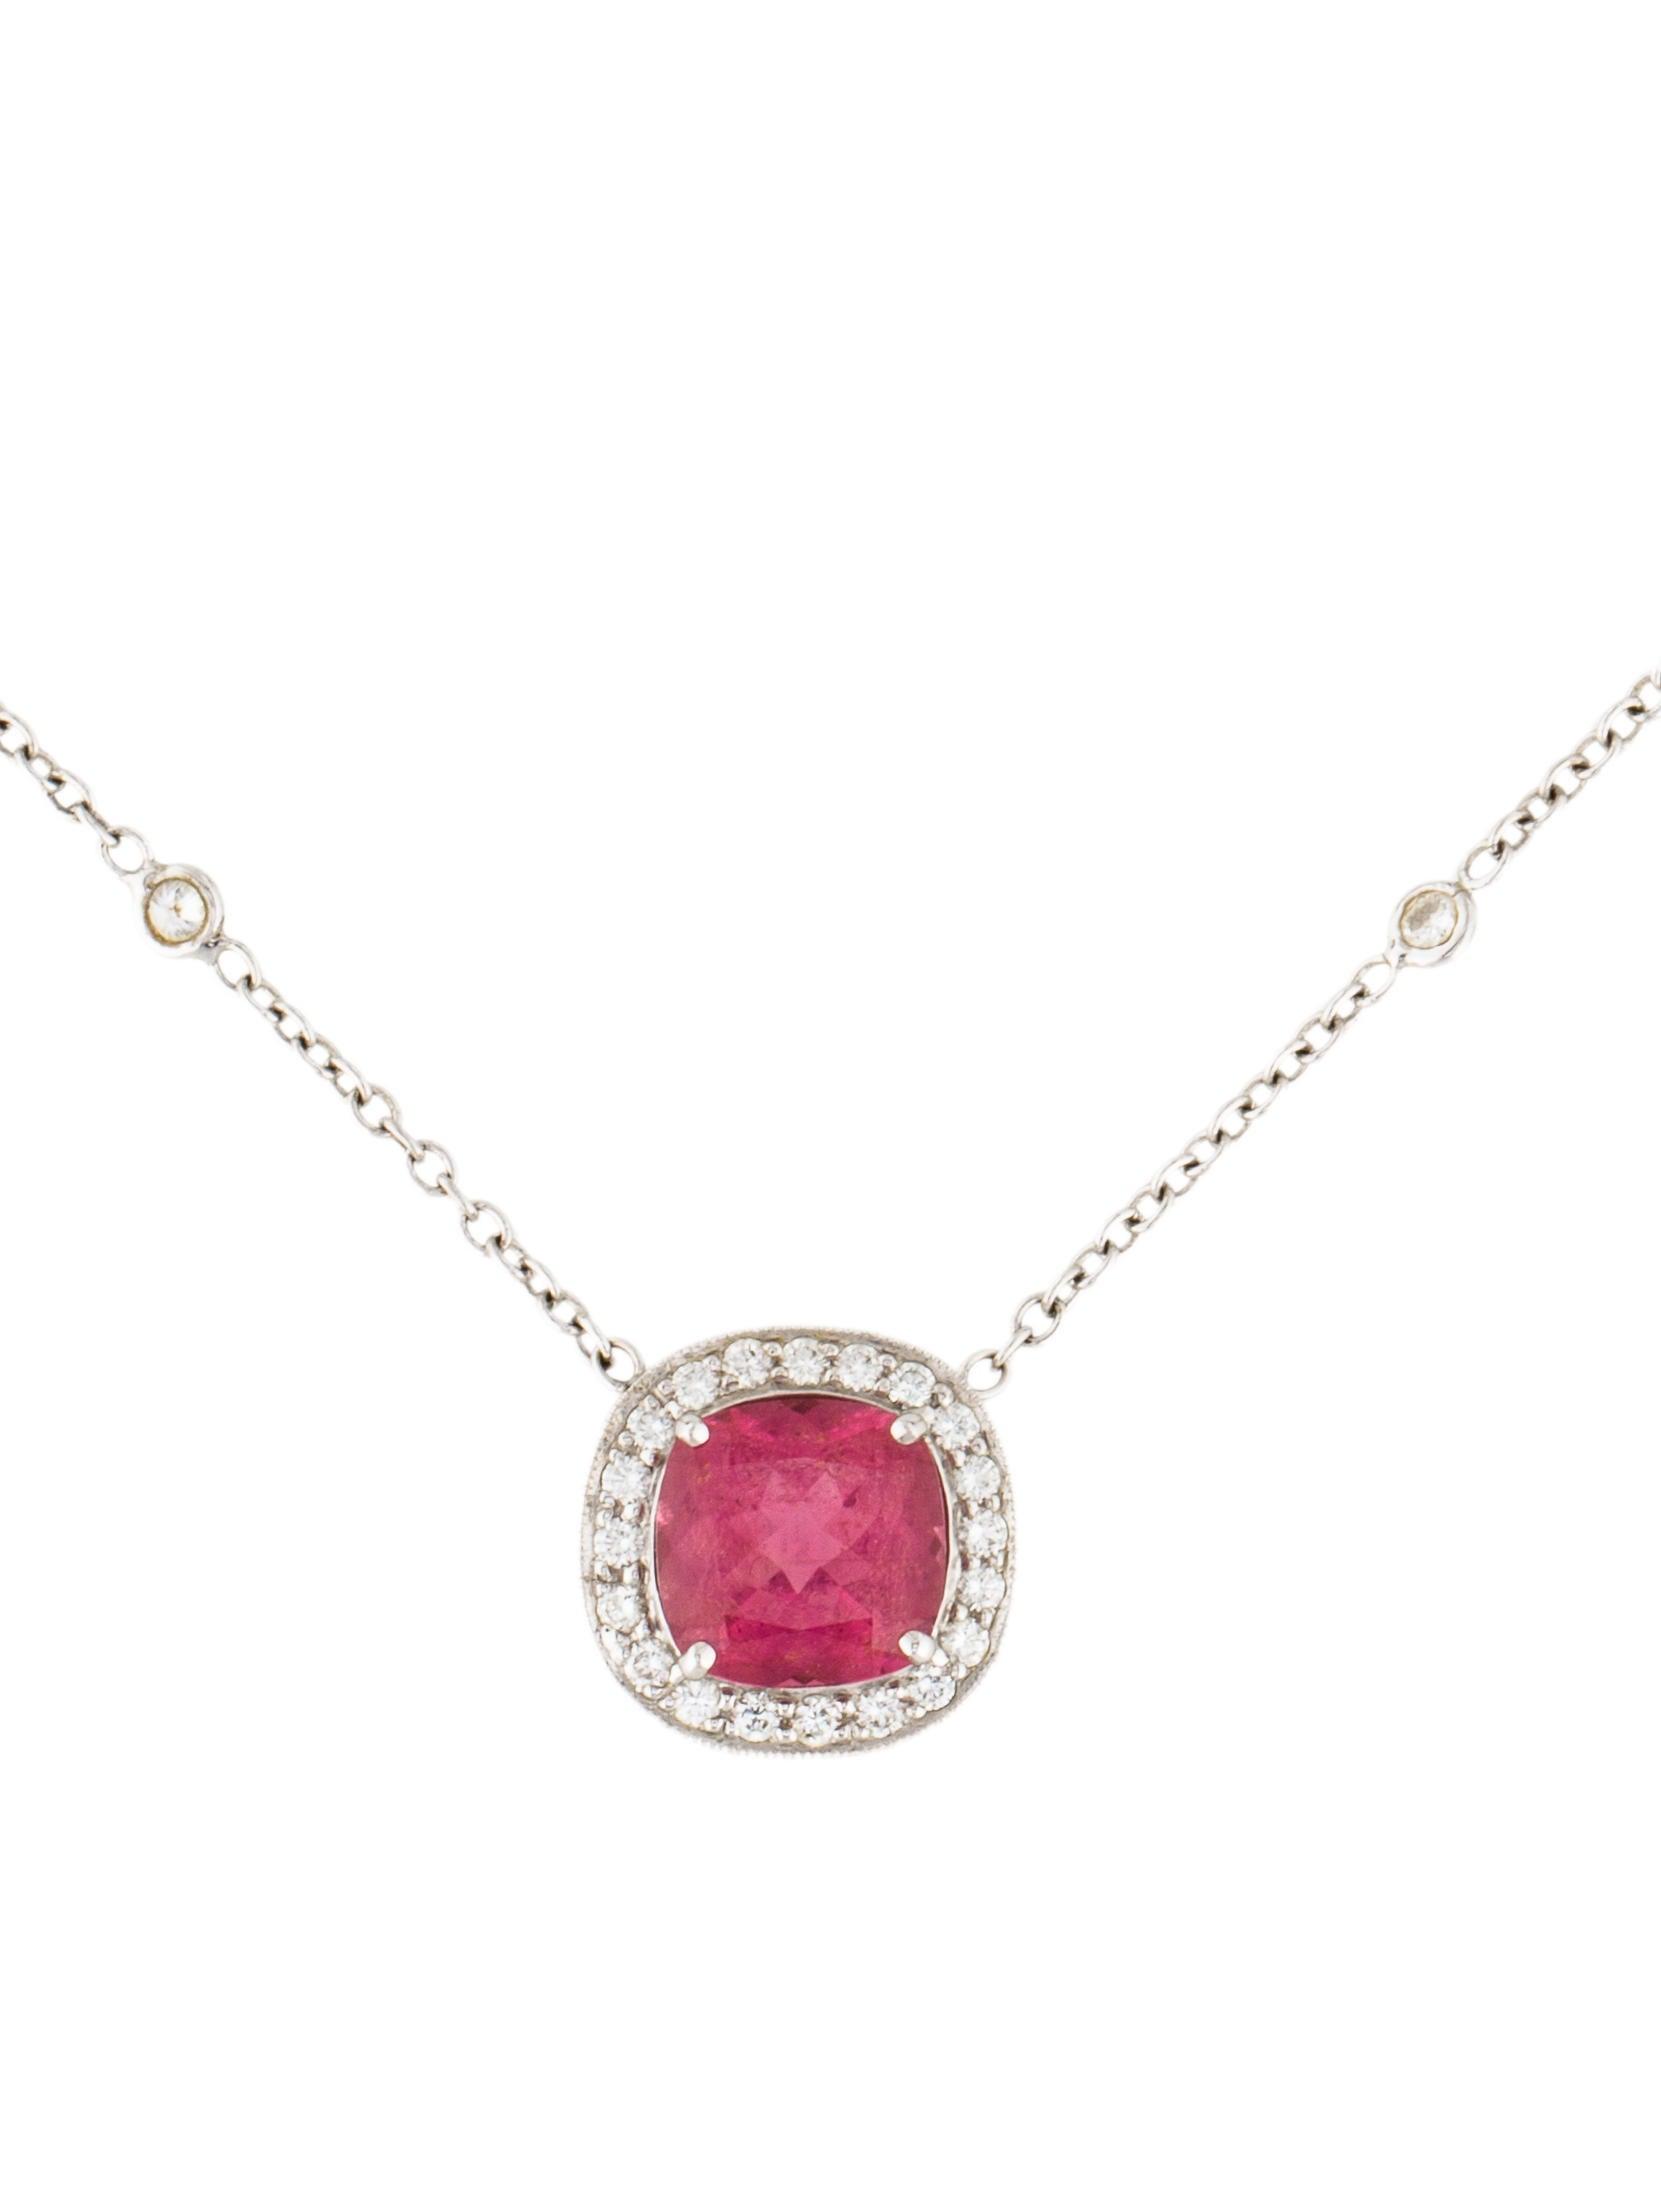 penny preville 18k pink tourmaline diamond pendant. Black Bedroom Furniture Sets. Home Design Ideas